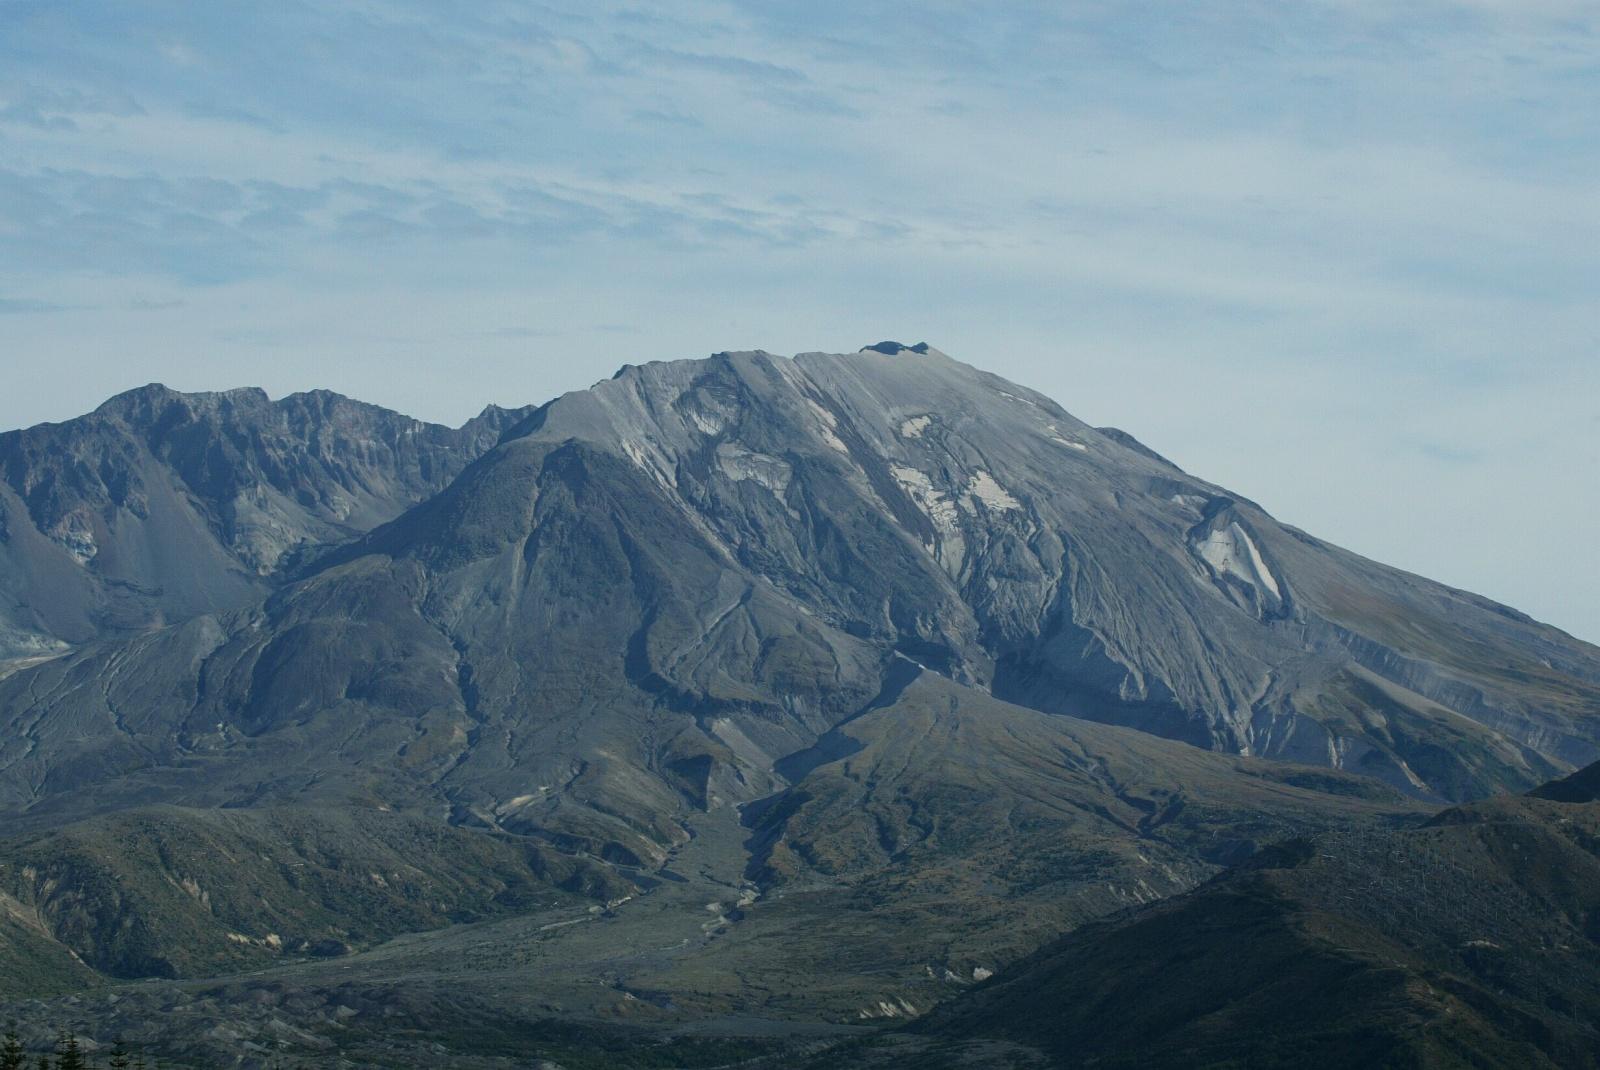 Mt. St. Helens Closeup view